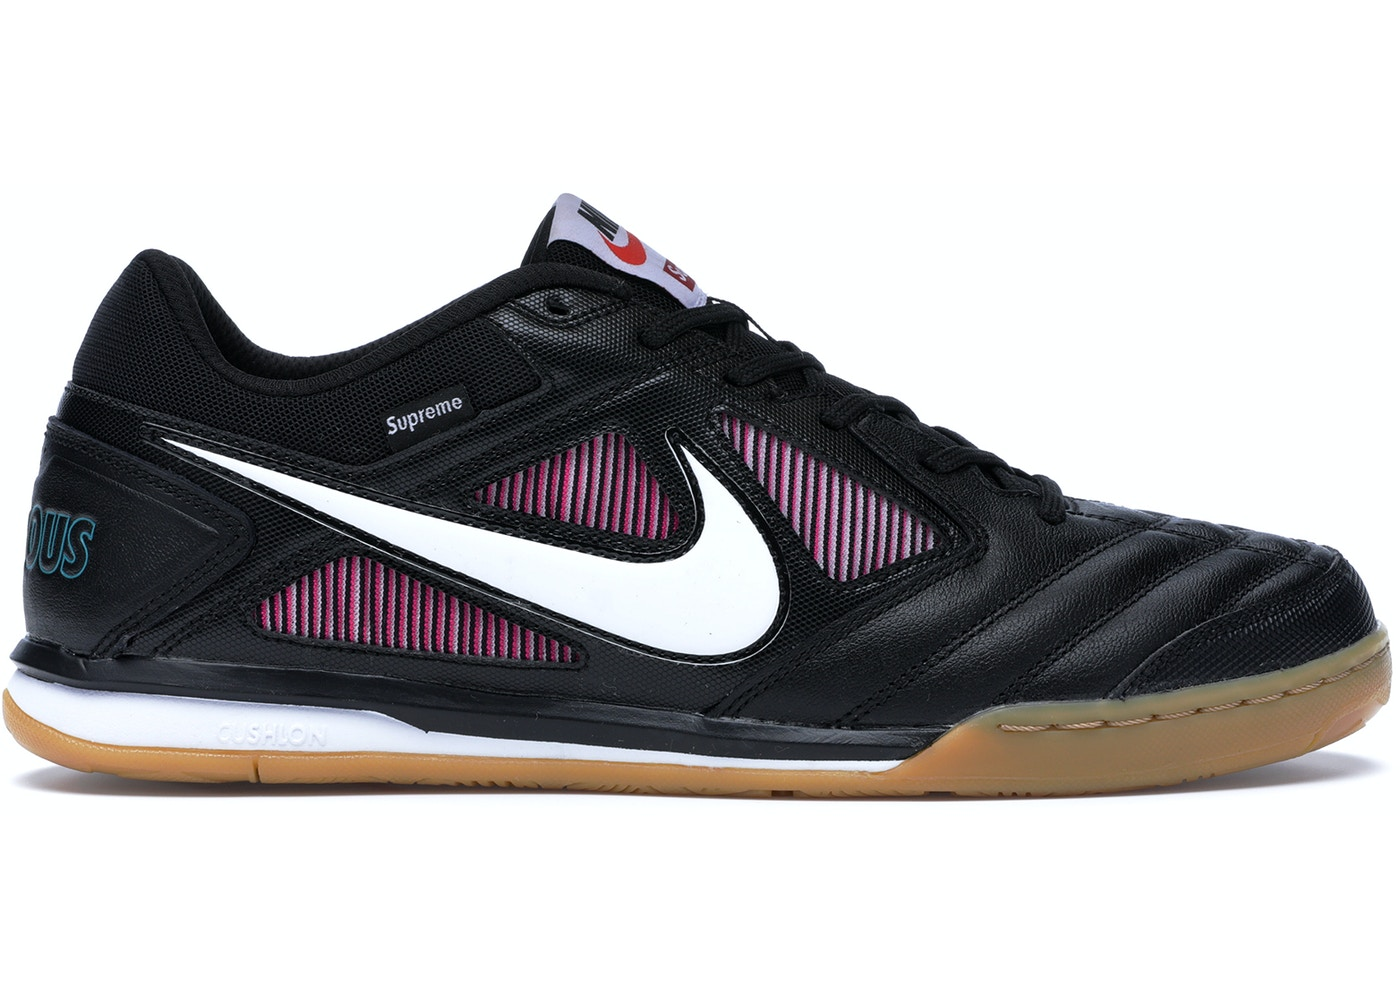 4abc5148d586 Nike SB Gato Supreme Black - AR9821-001